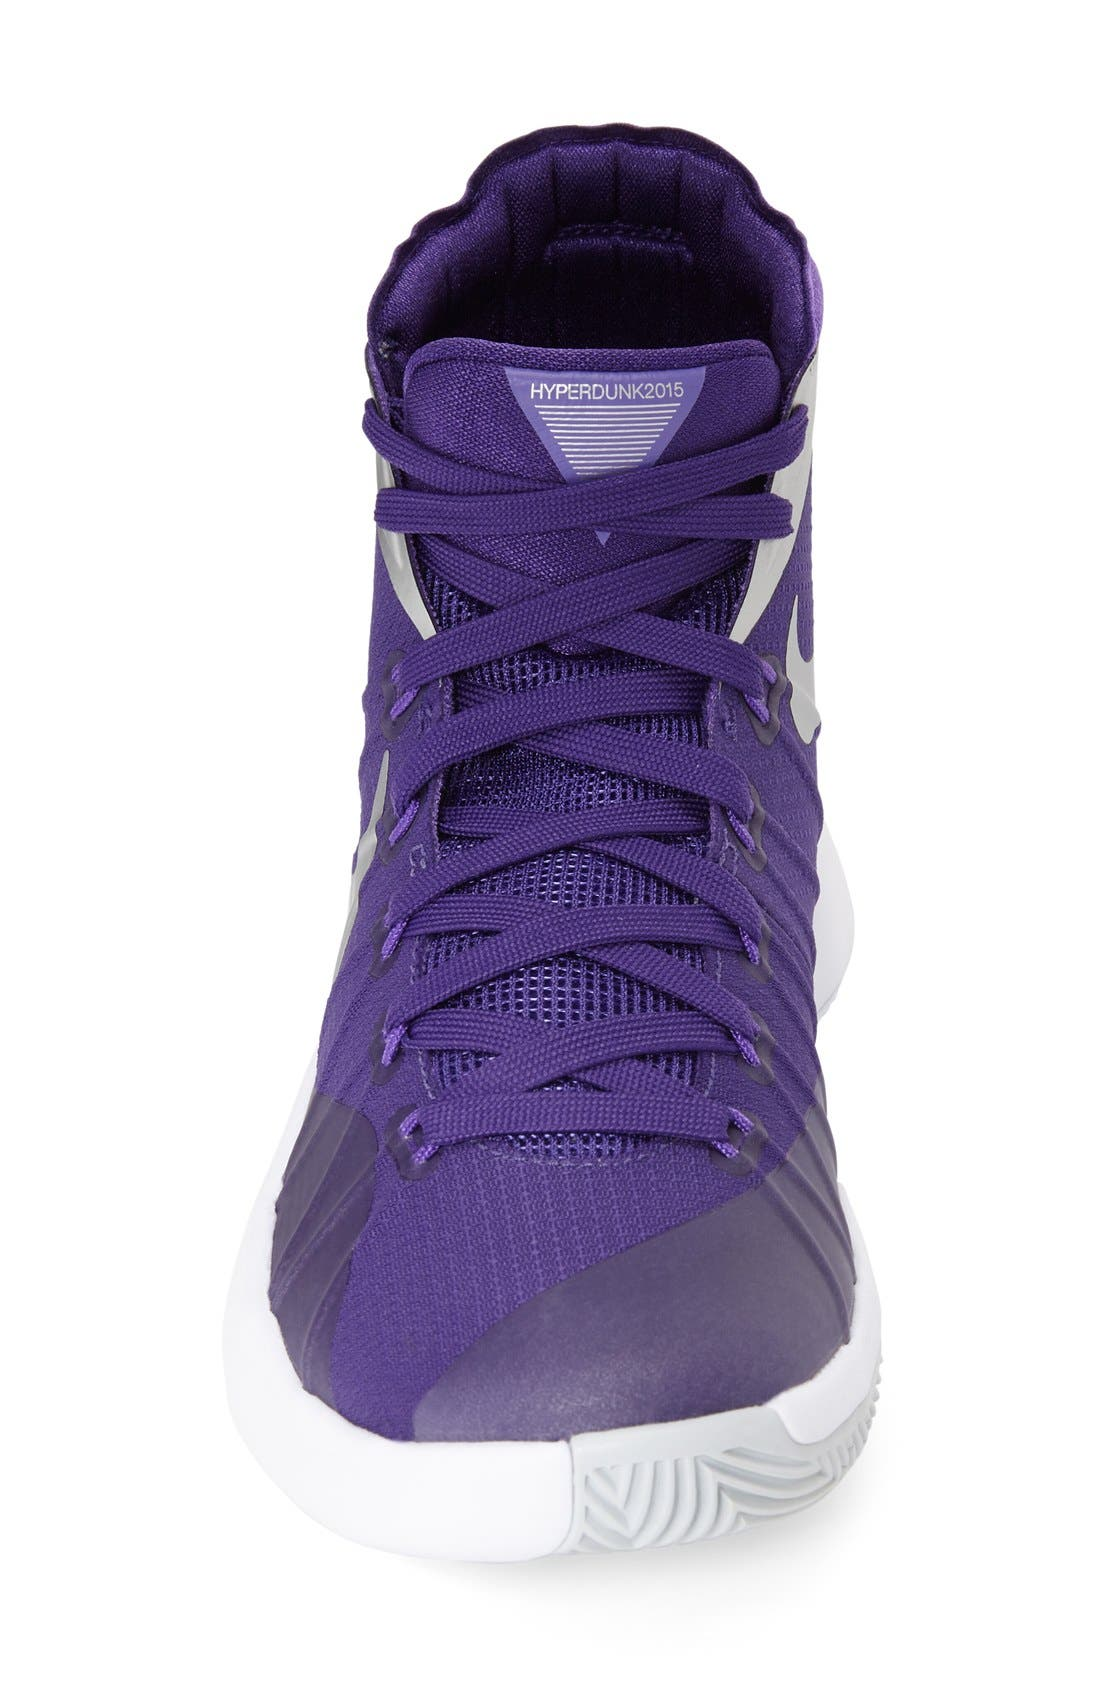 Alternate Image 3  - Nike 'Hyperdunk 2015' Basketball Shoe (Women)